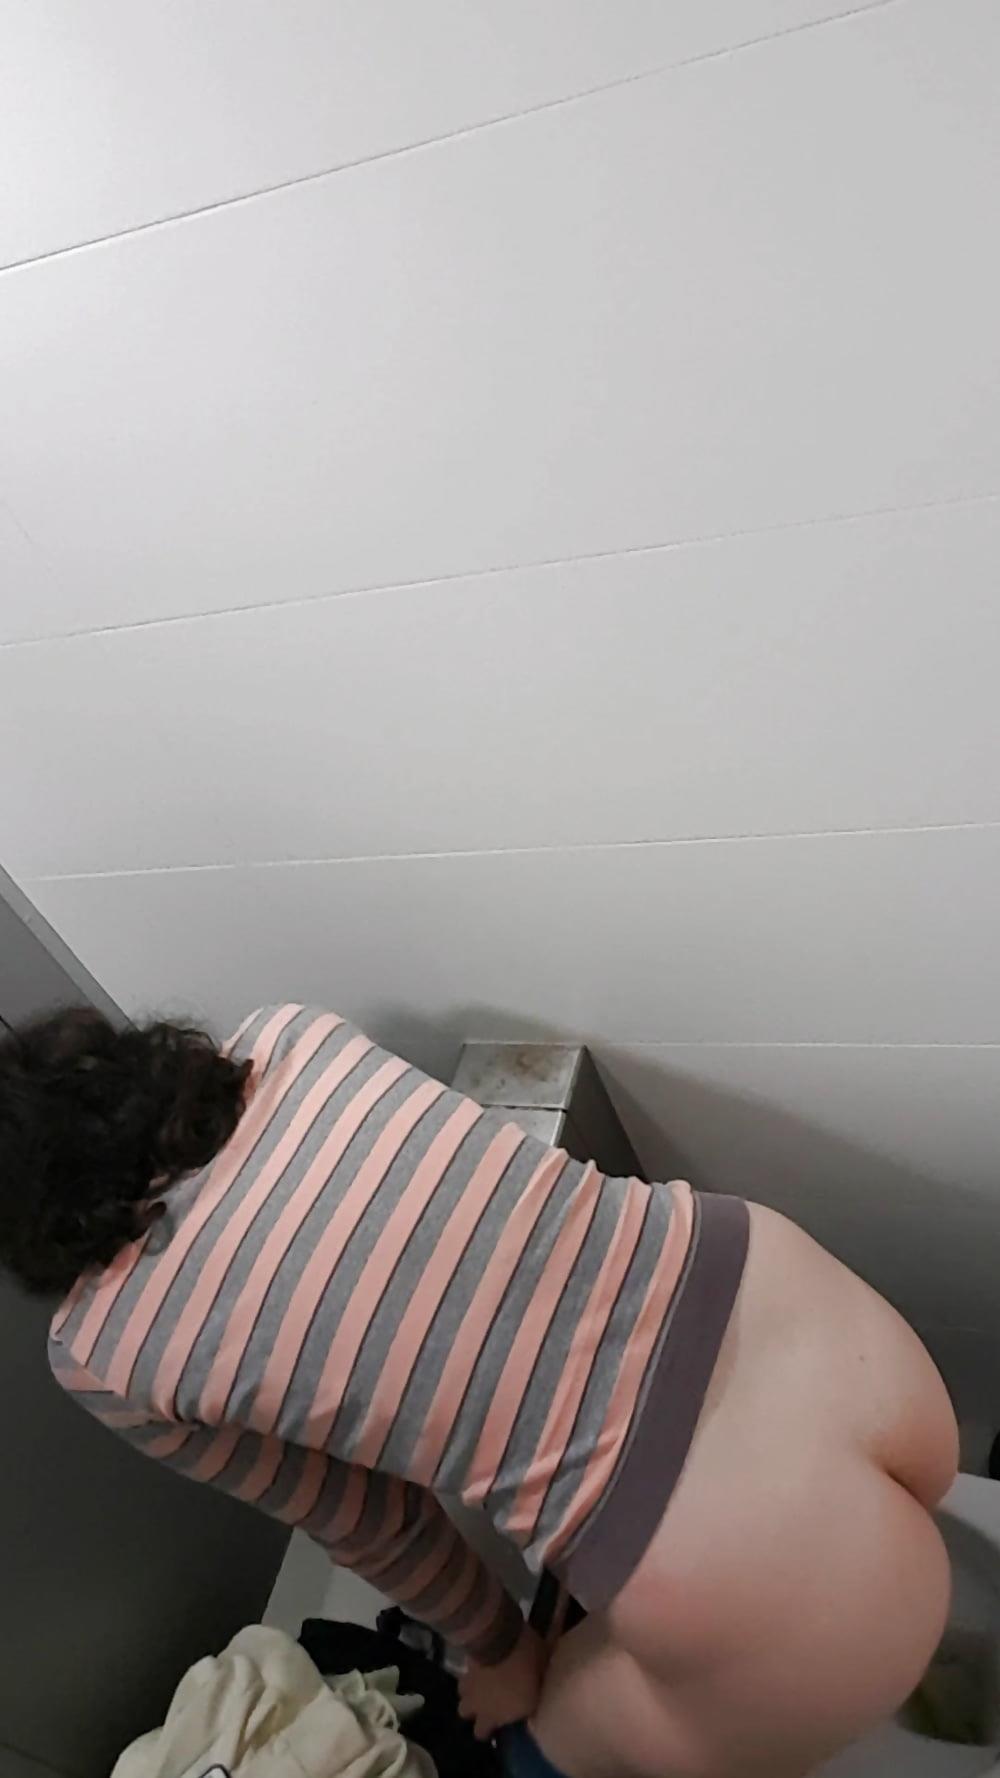 Public toilet spy cam porn-5994